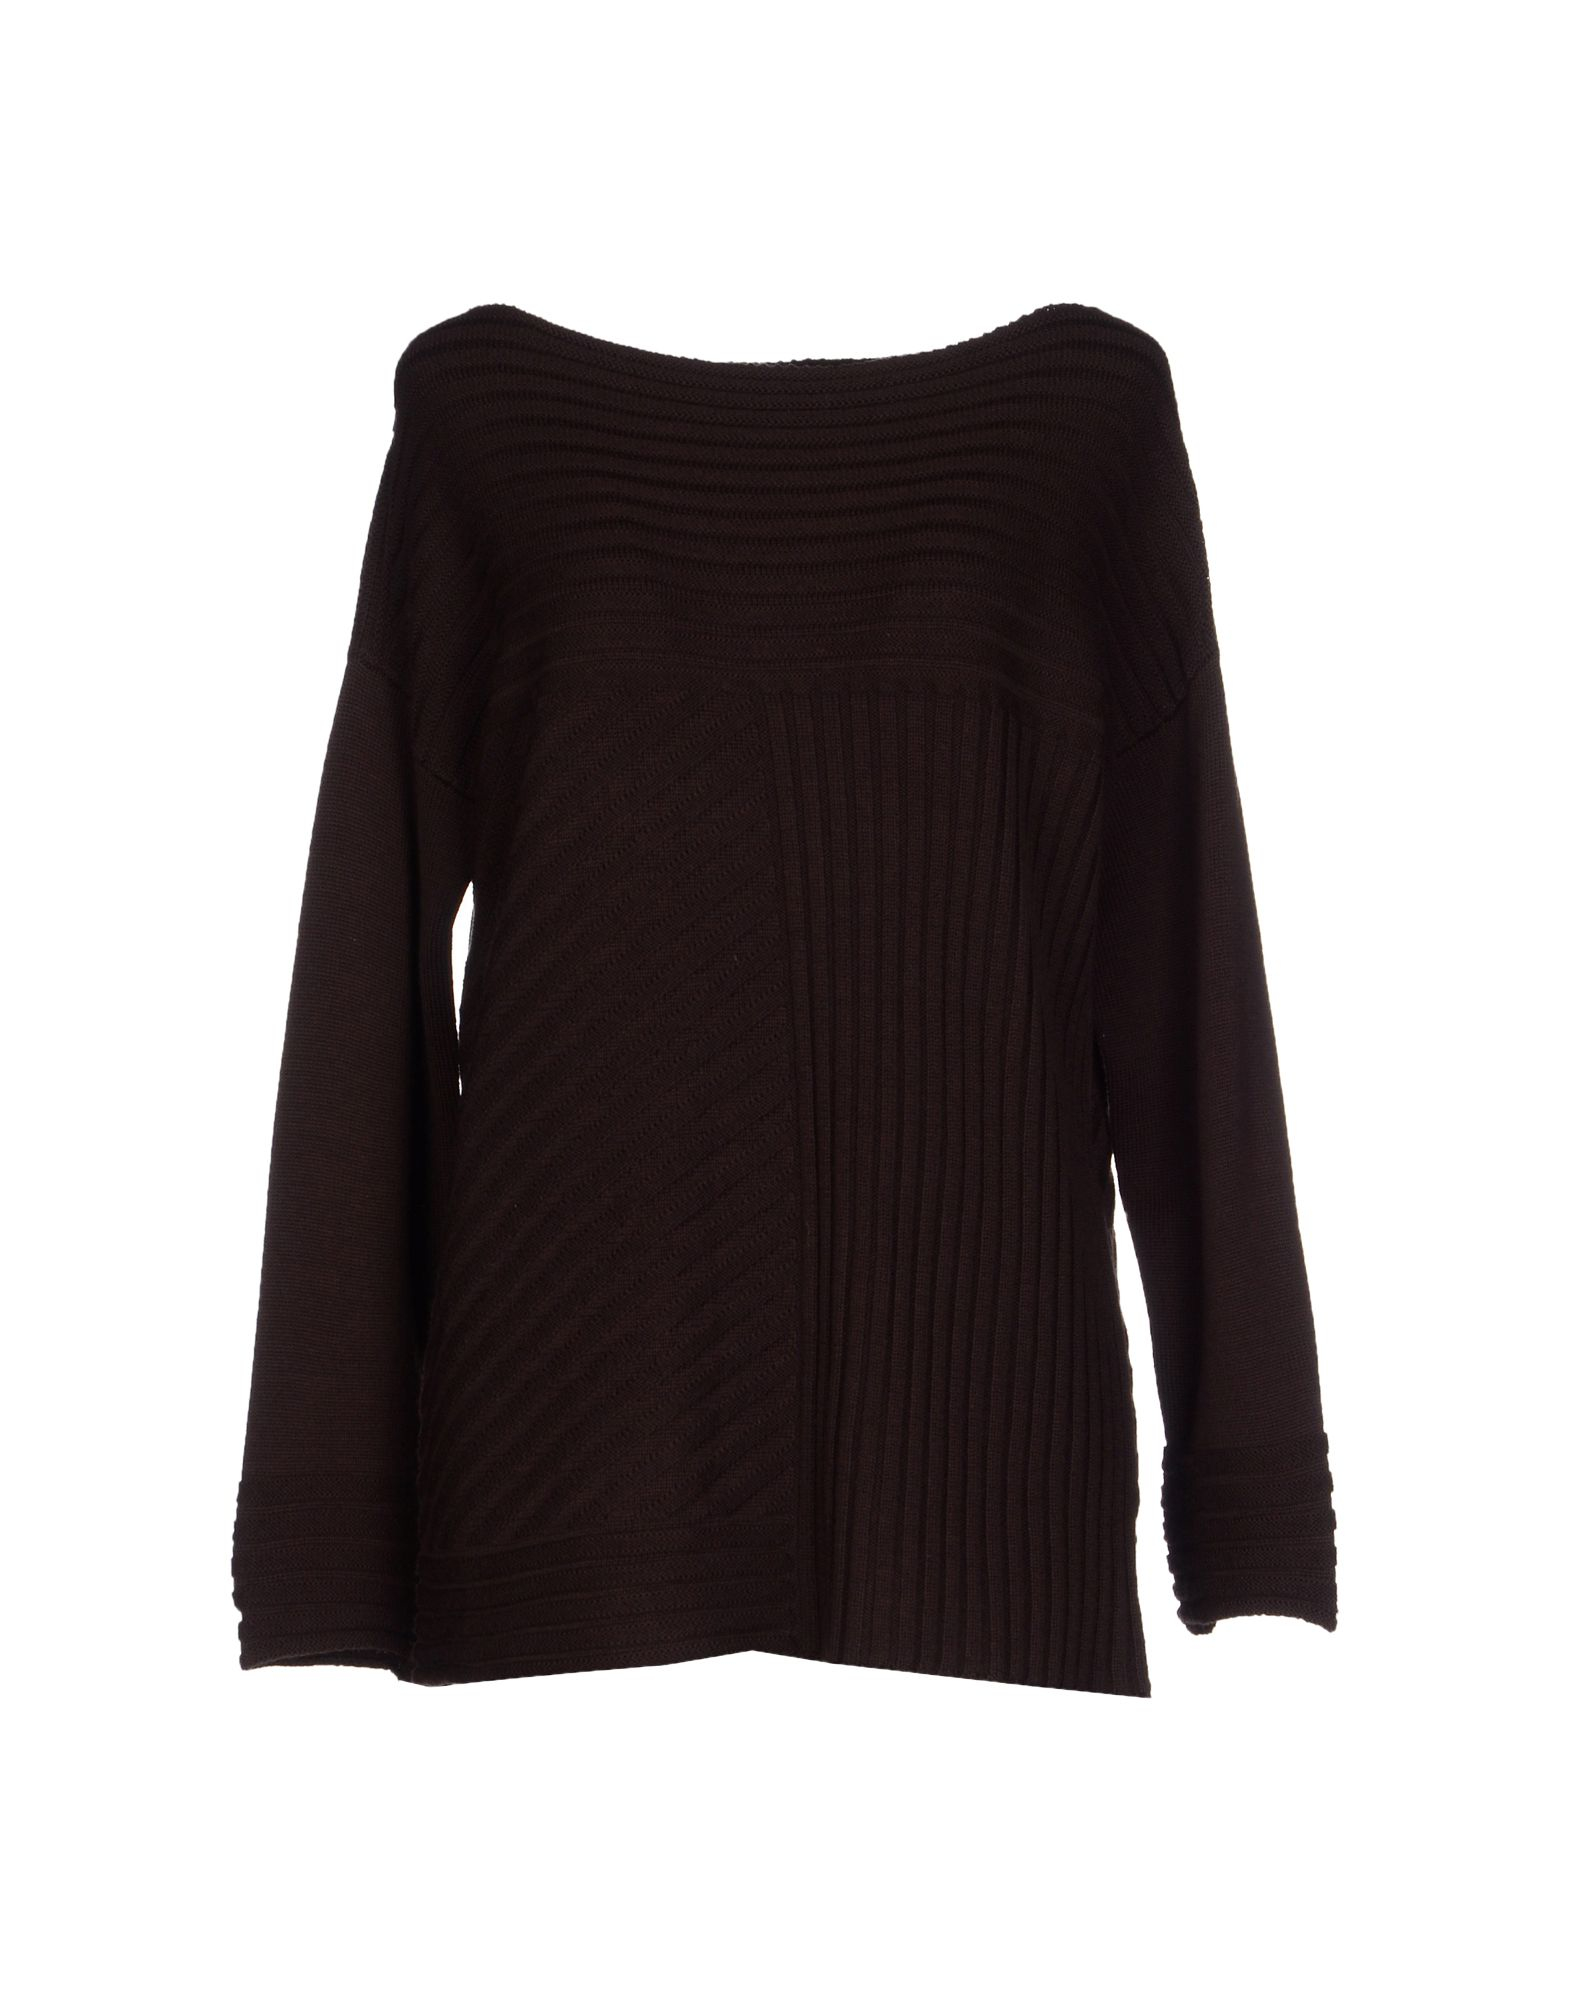 88041f8de1b0a alpha-massimo-rebecchi-dark-brown-sweater-brown-product-1-097171734-normal.jpeg